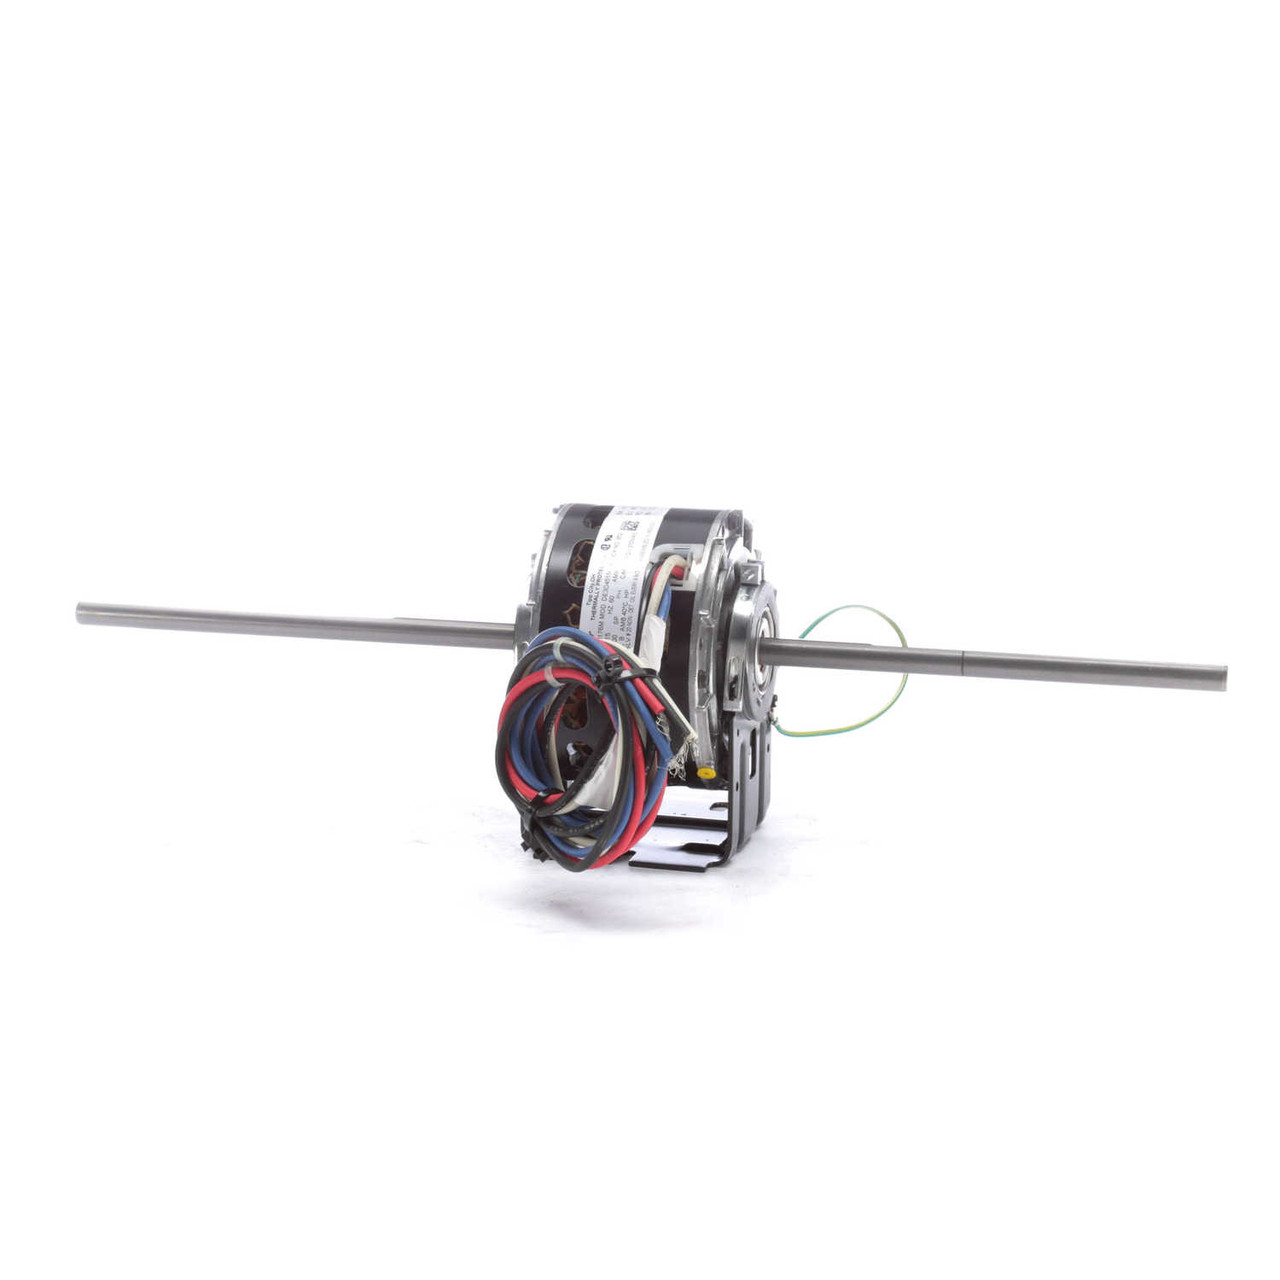 trane hvac electric motor  x70500149 30 hp 1100 rpm 115v century   952